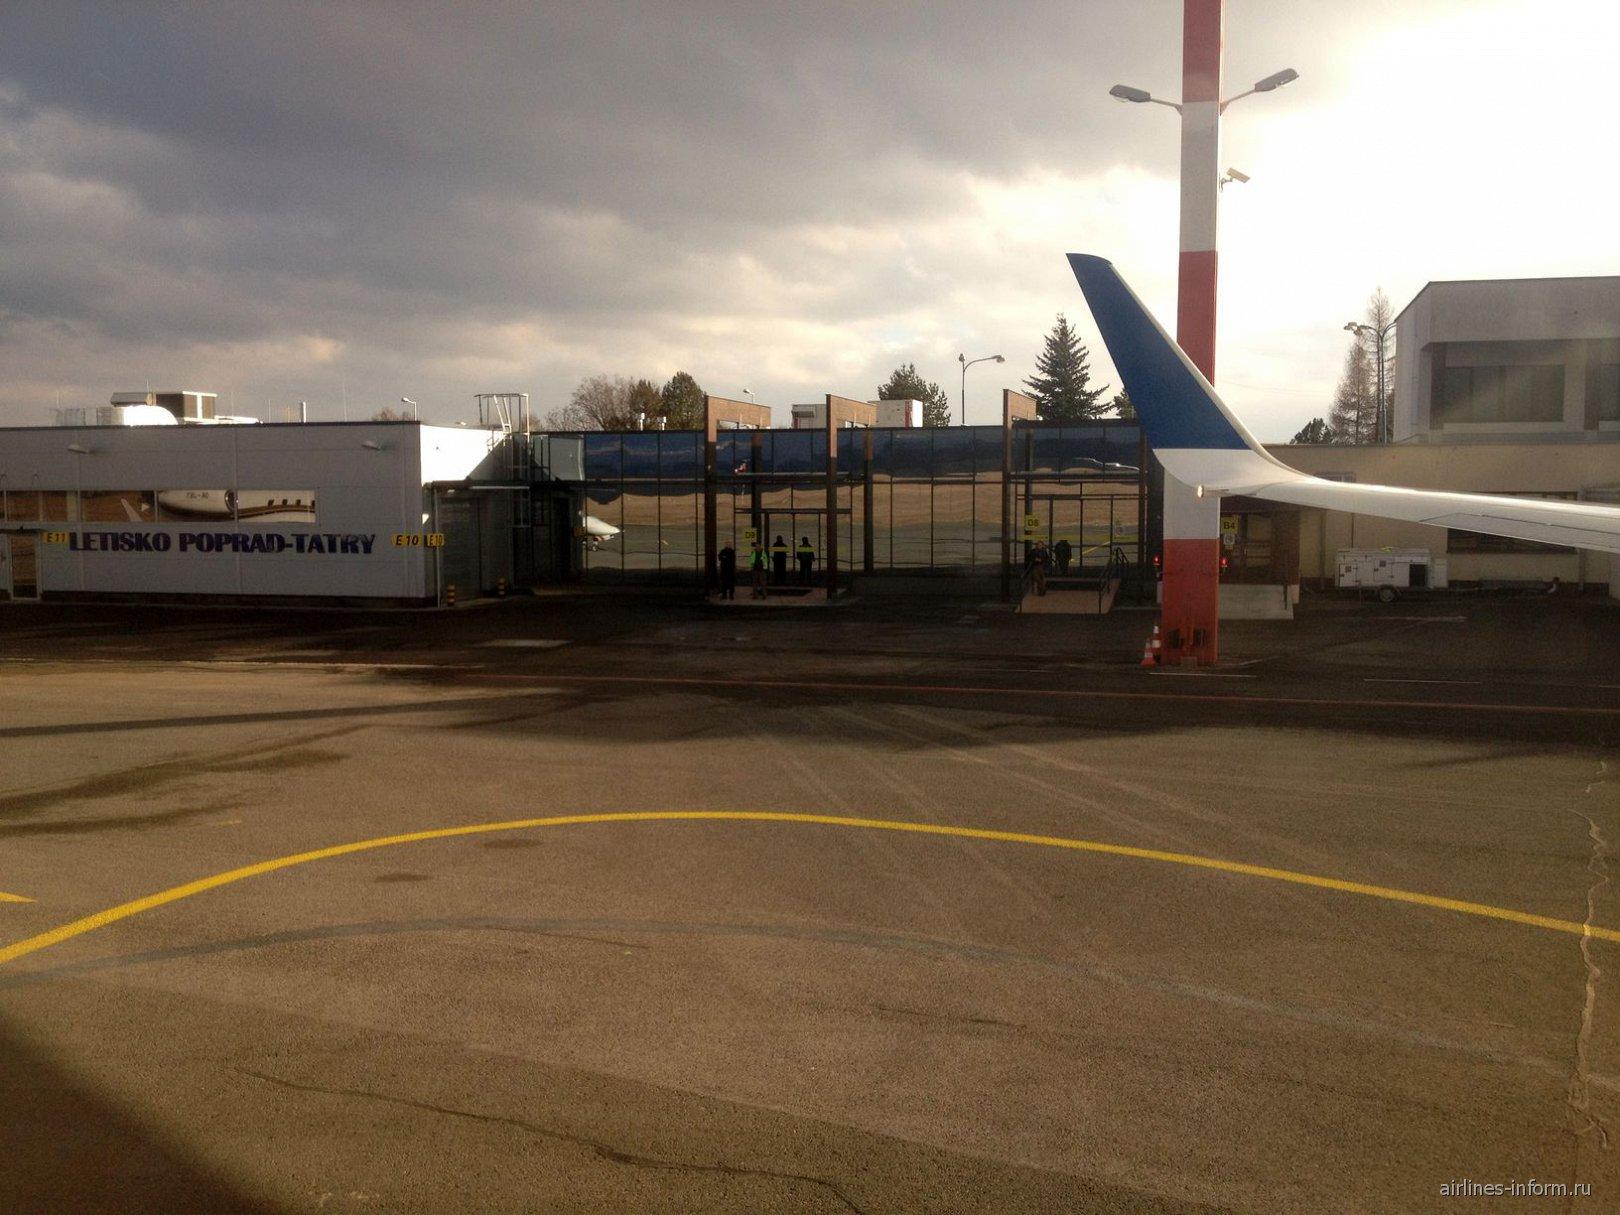 Терминал прилета аэропорта Попрад